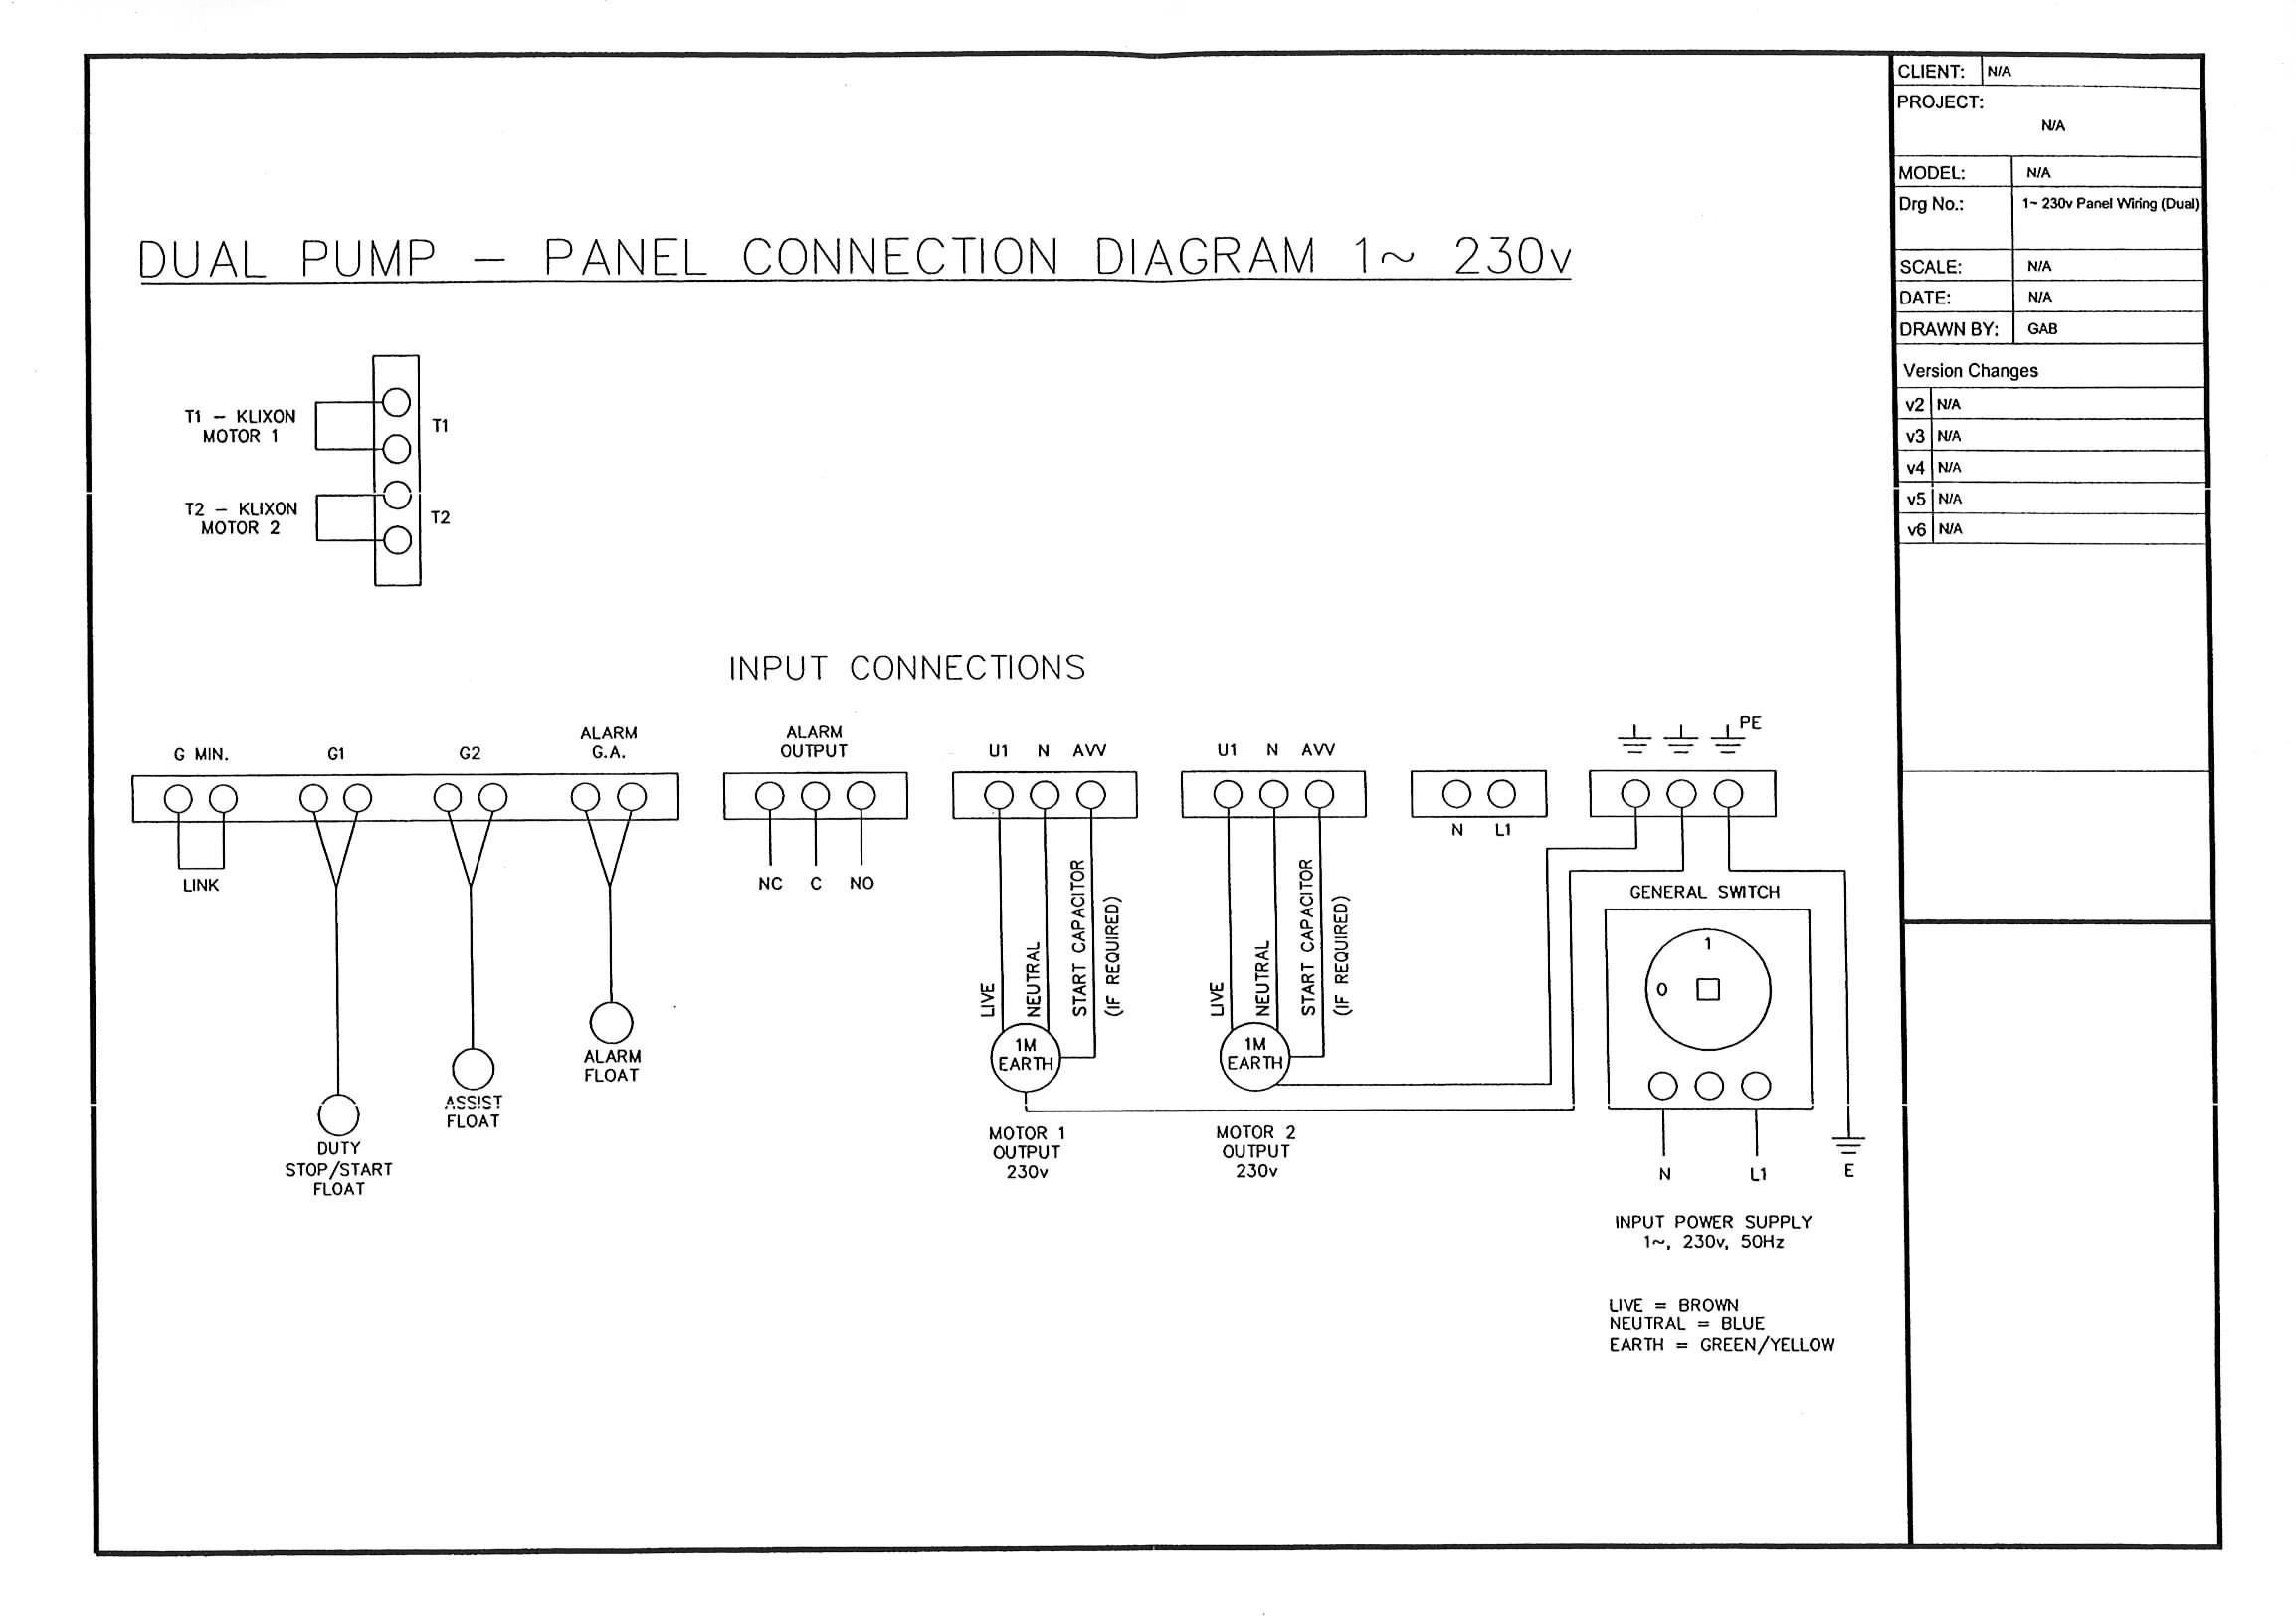 LT_5432] Duplex Pump Wiring Diagram Download Diagram | Pump Panel Wiring Diagram |  | Wida Bdel Mohammedshrine Librar Wiring 101